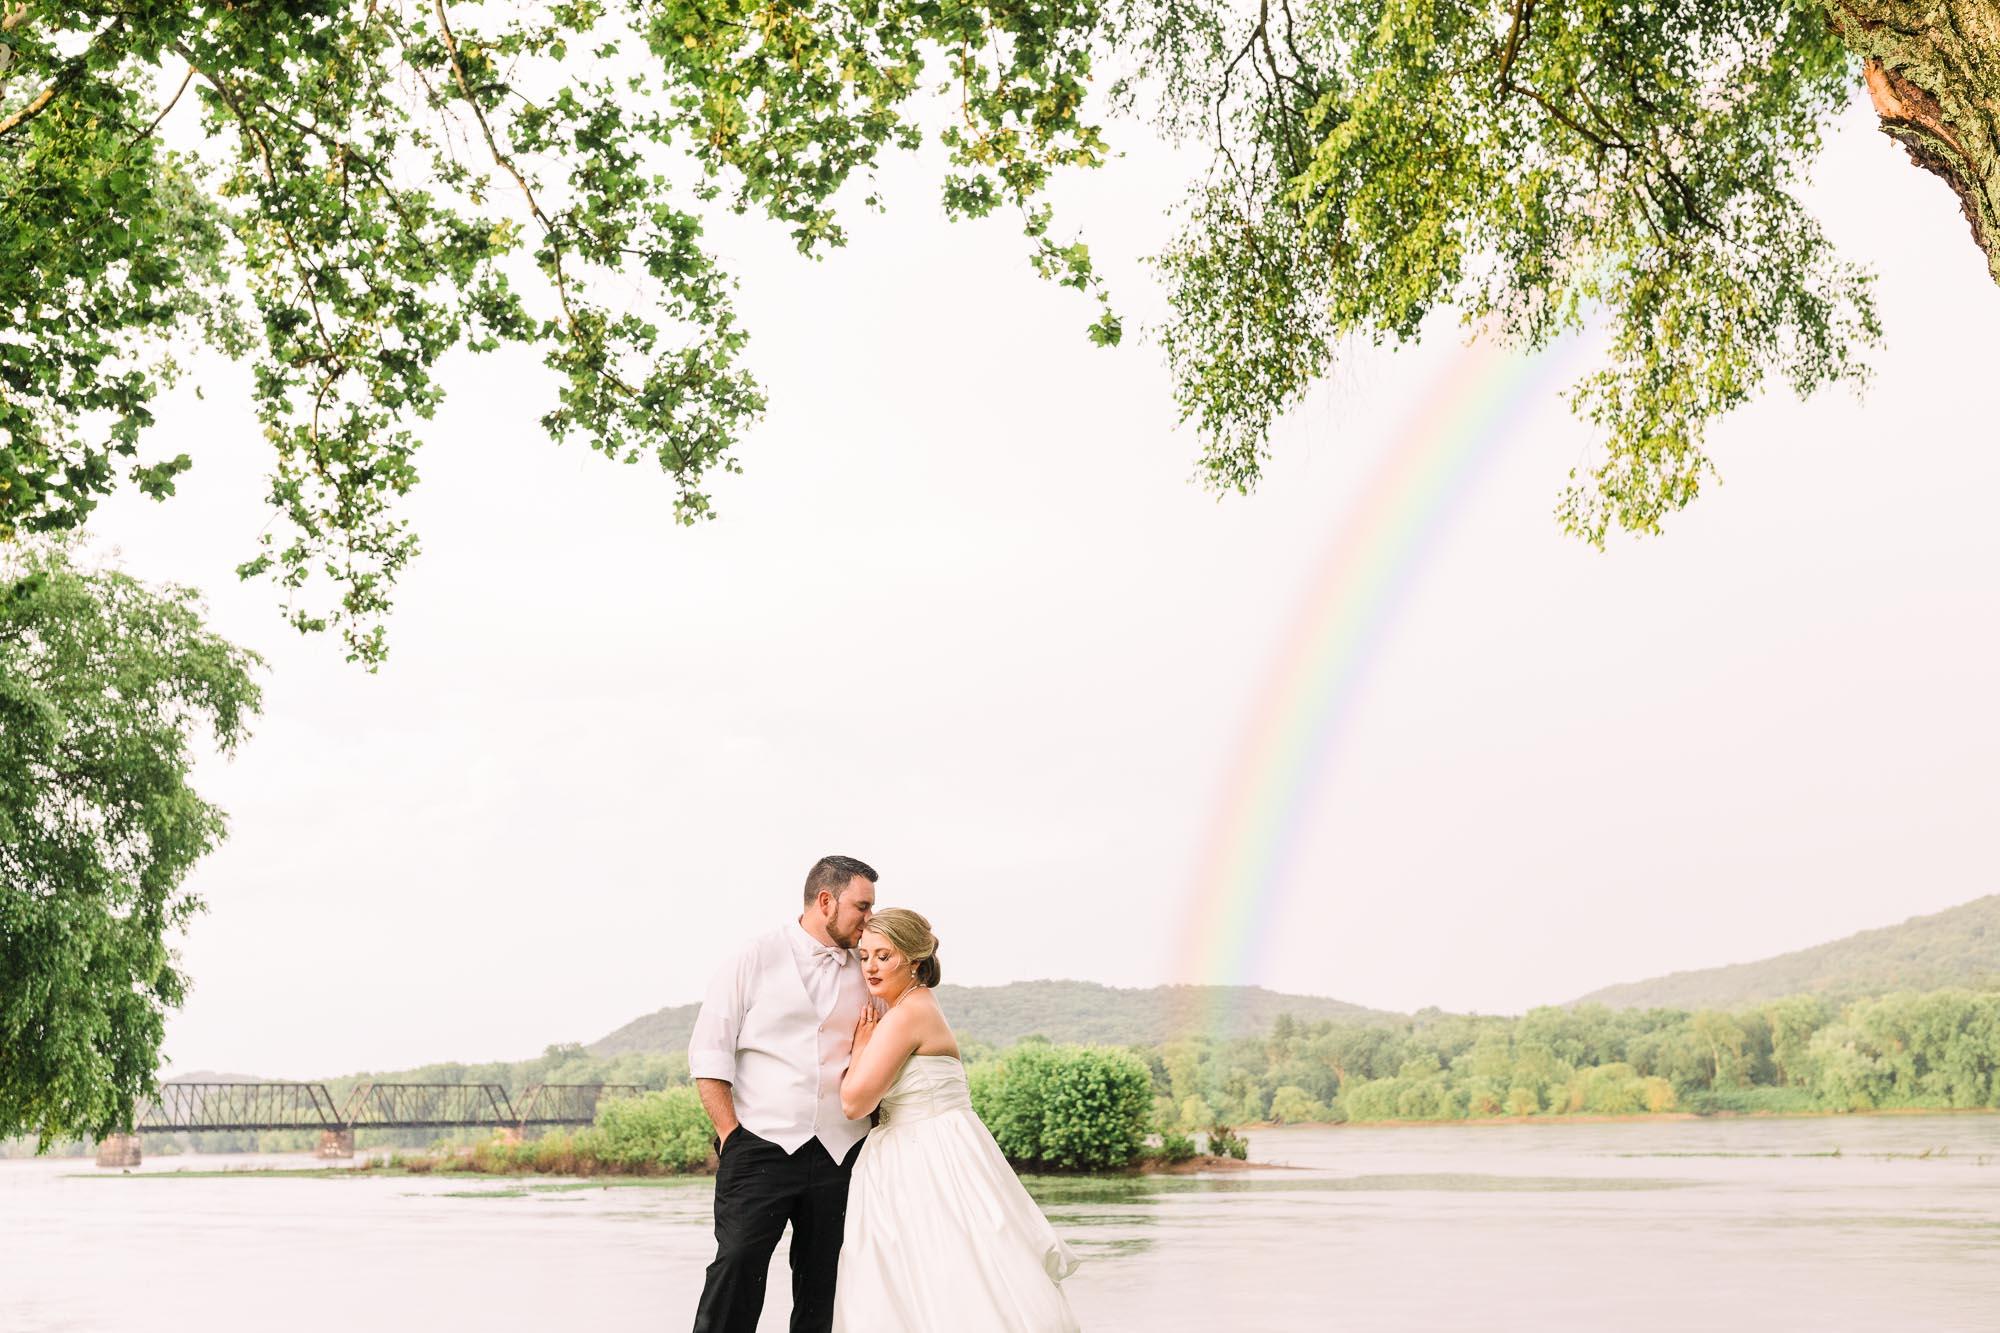 isle-of-que-wedding-2.jpg